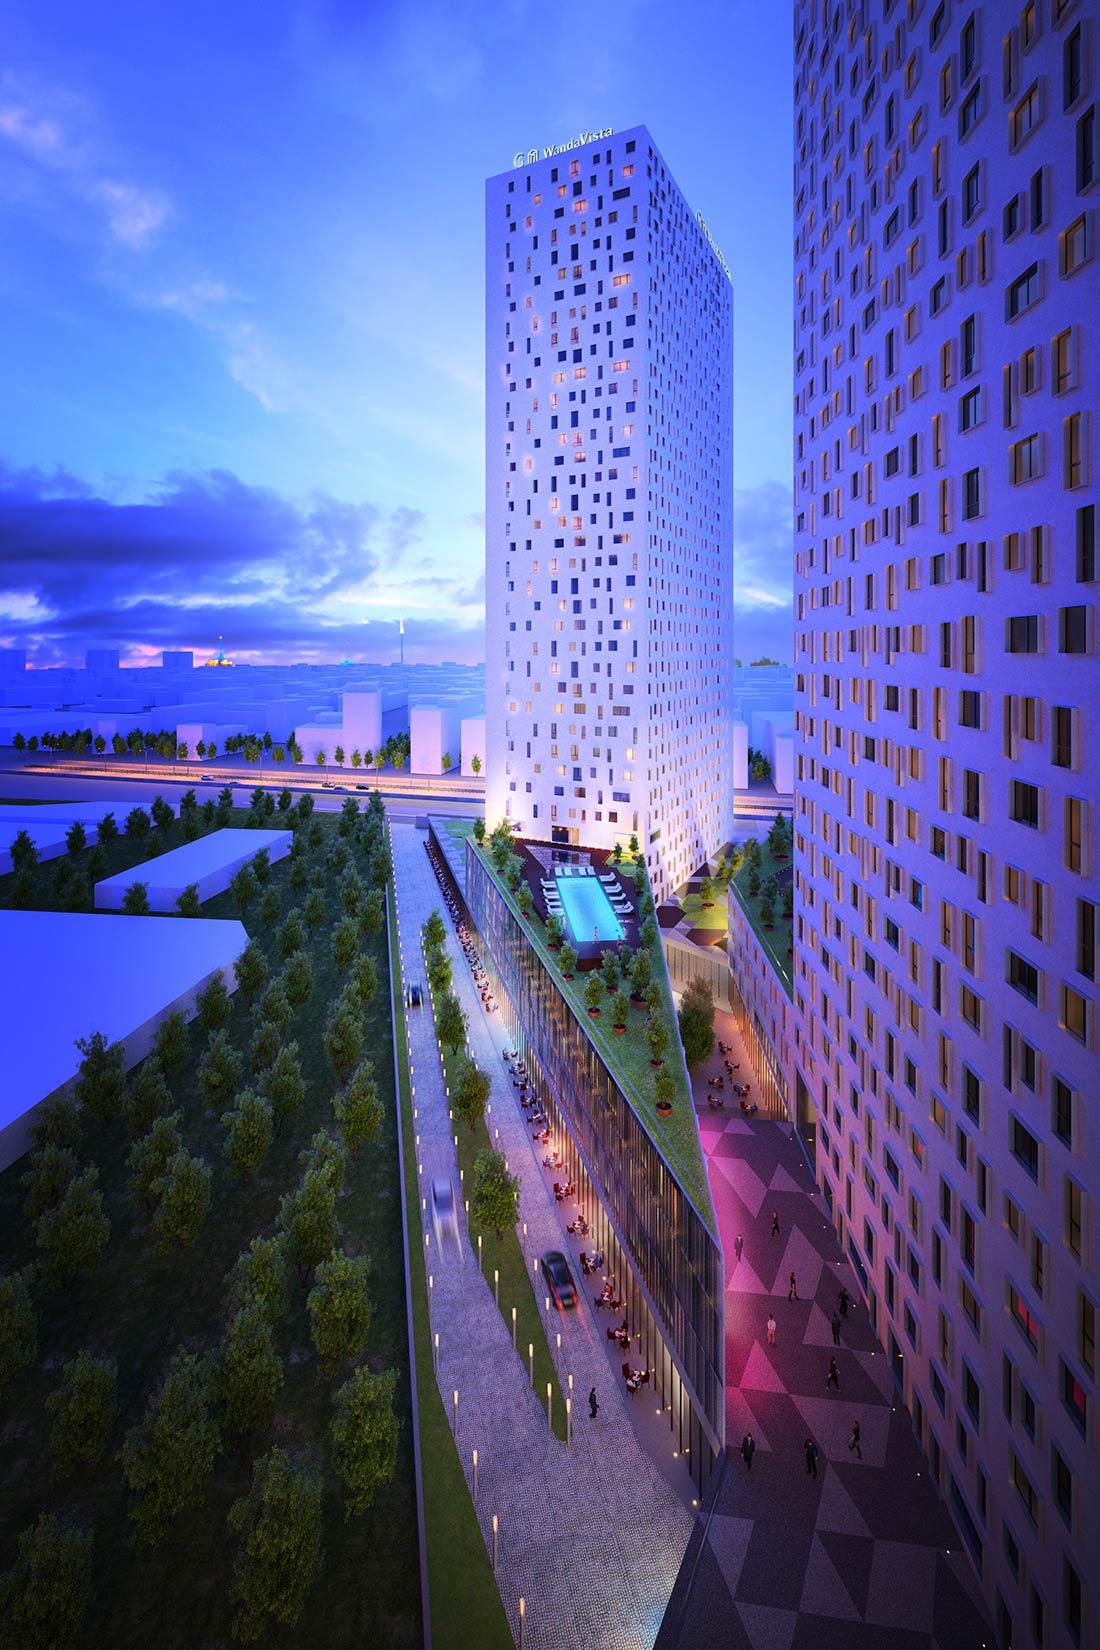 wanda-vista-residence-istanbul-for-sale-real-etate00120